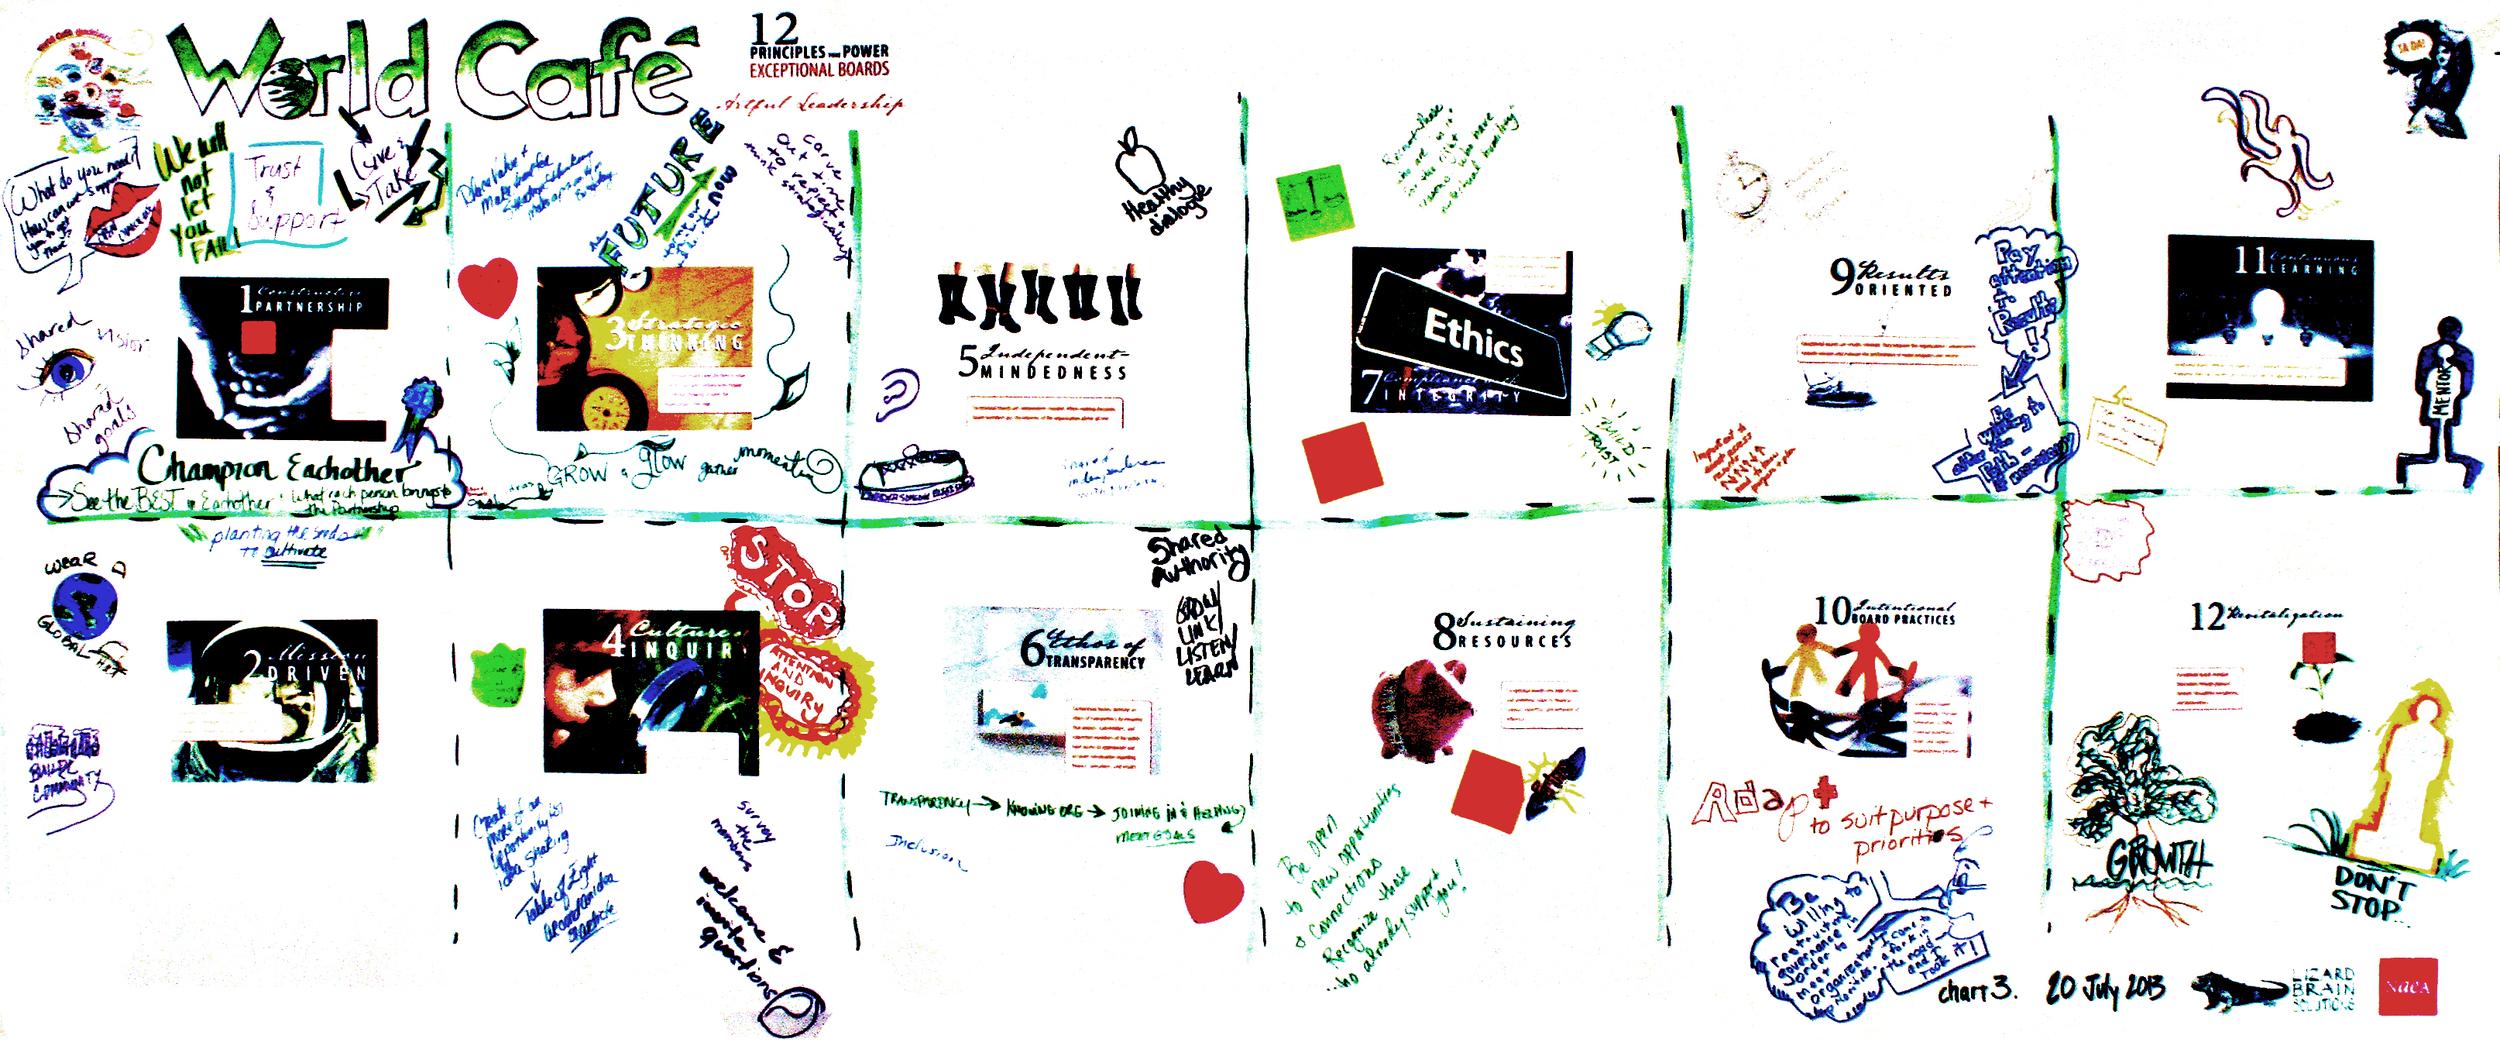 NAEA 20 July 2013 chart 3 World Cafe.jpg